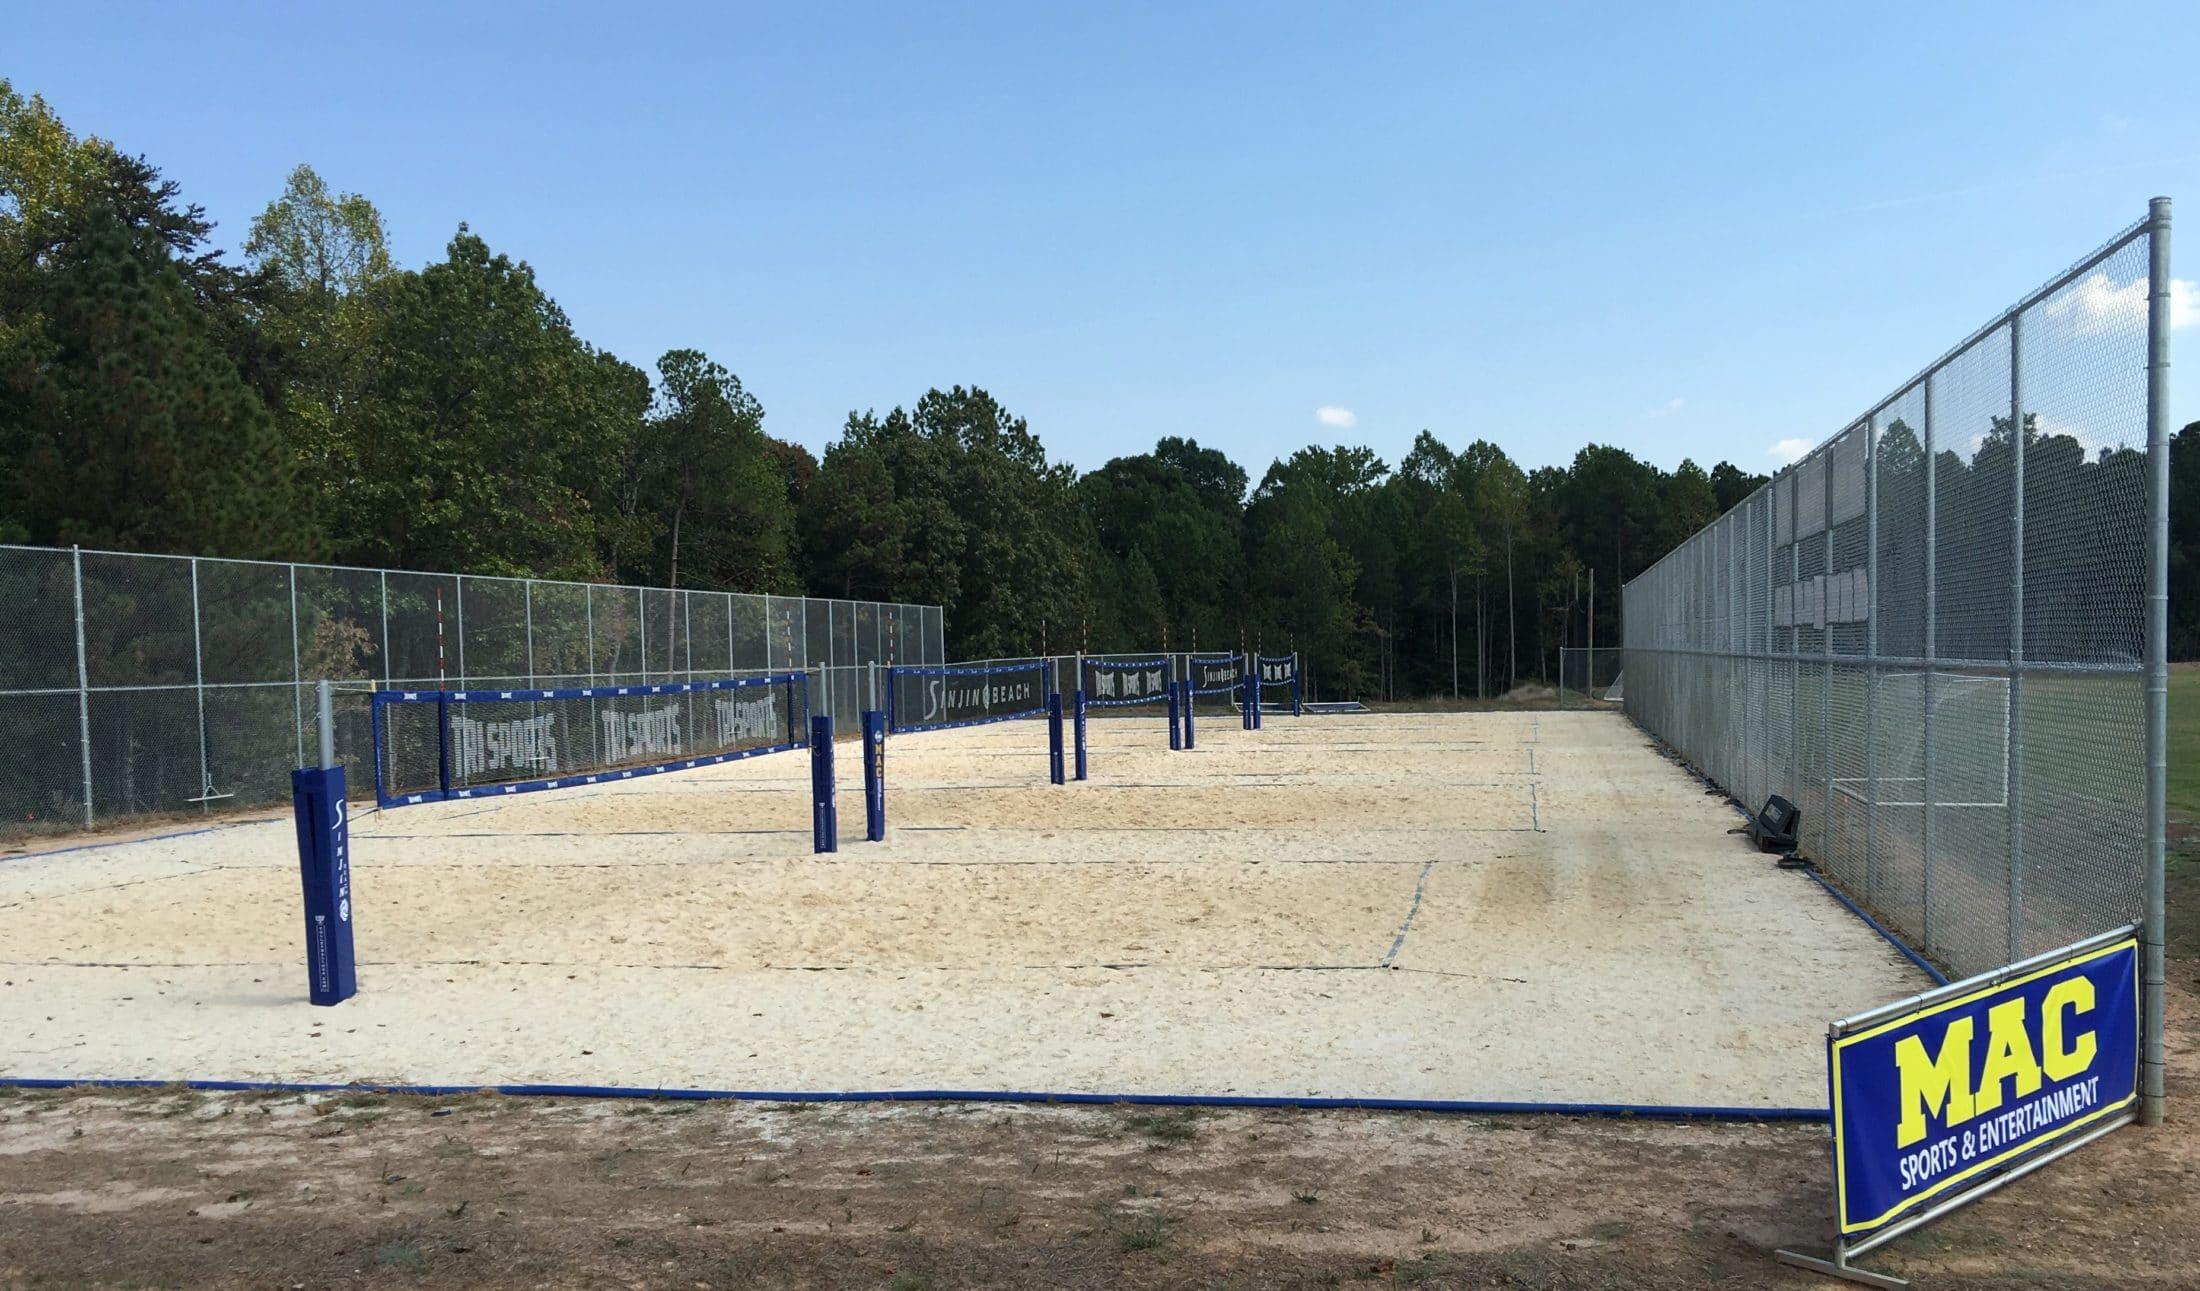 Sinjin Beach Volleyball Club